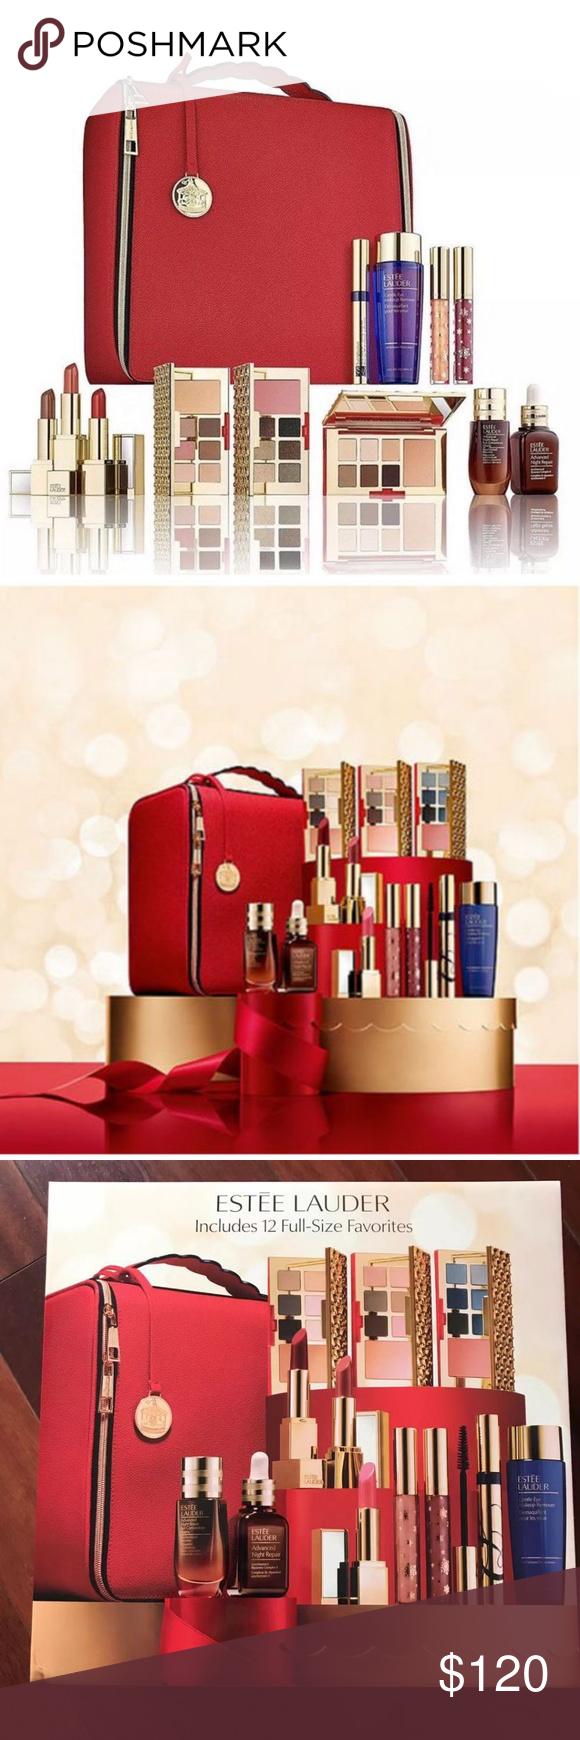 Estee Lauder 2018 Holiday Blockbuster Warm Estee Lauder 2018 Holiday Blockbuster Makeup Gift Set Warm Collectio Pure Color Envy Makeup Gift Sets Estee Lauder